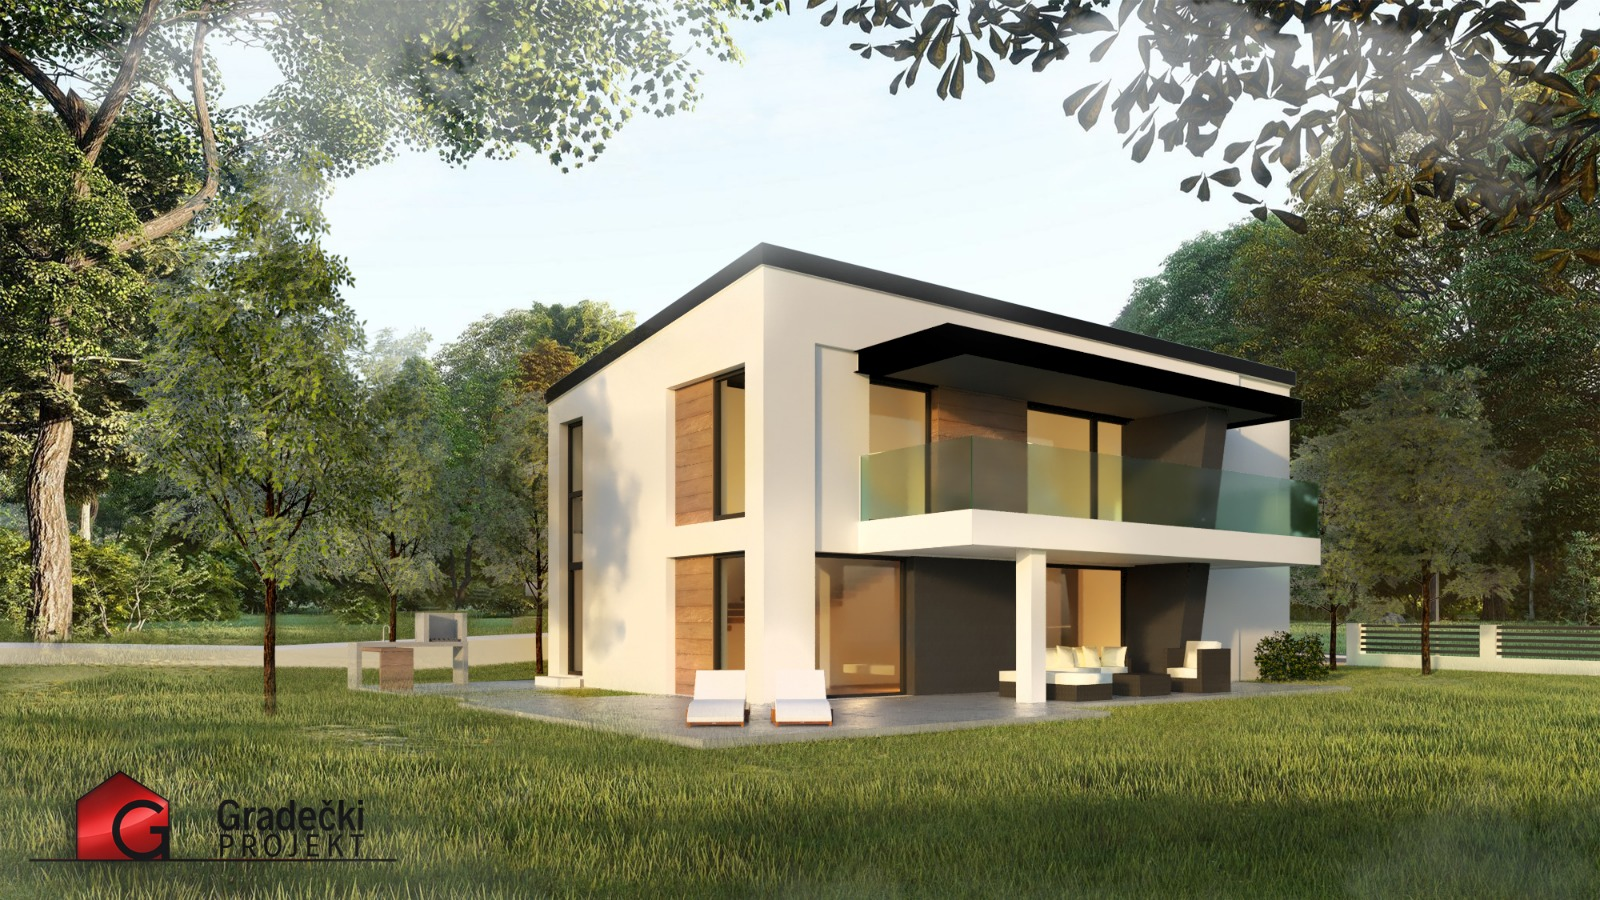 Passiv haus - GP arhitektura